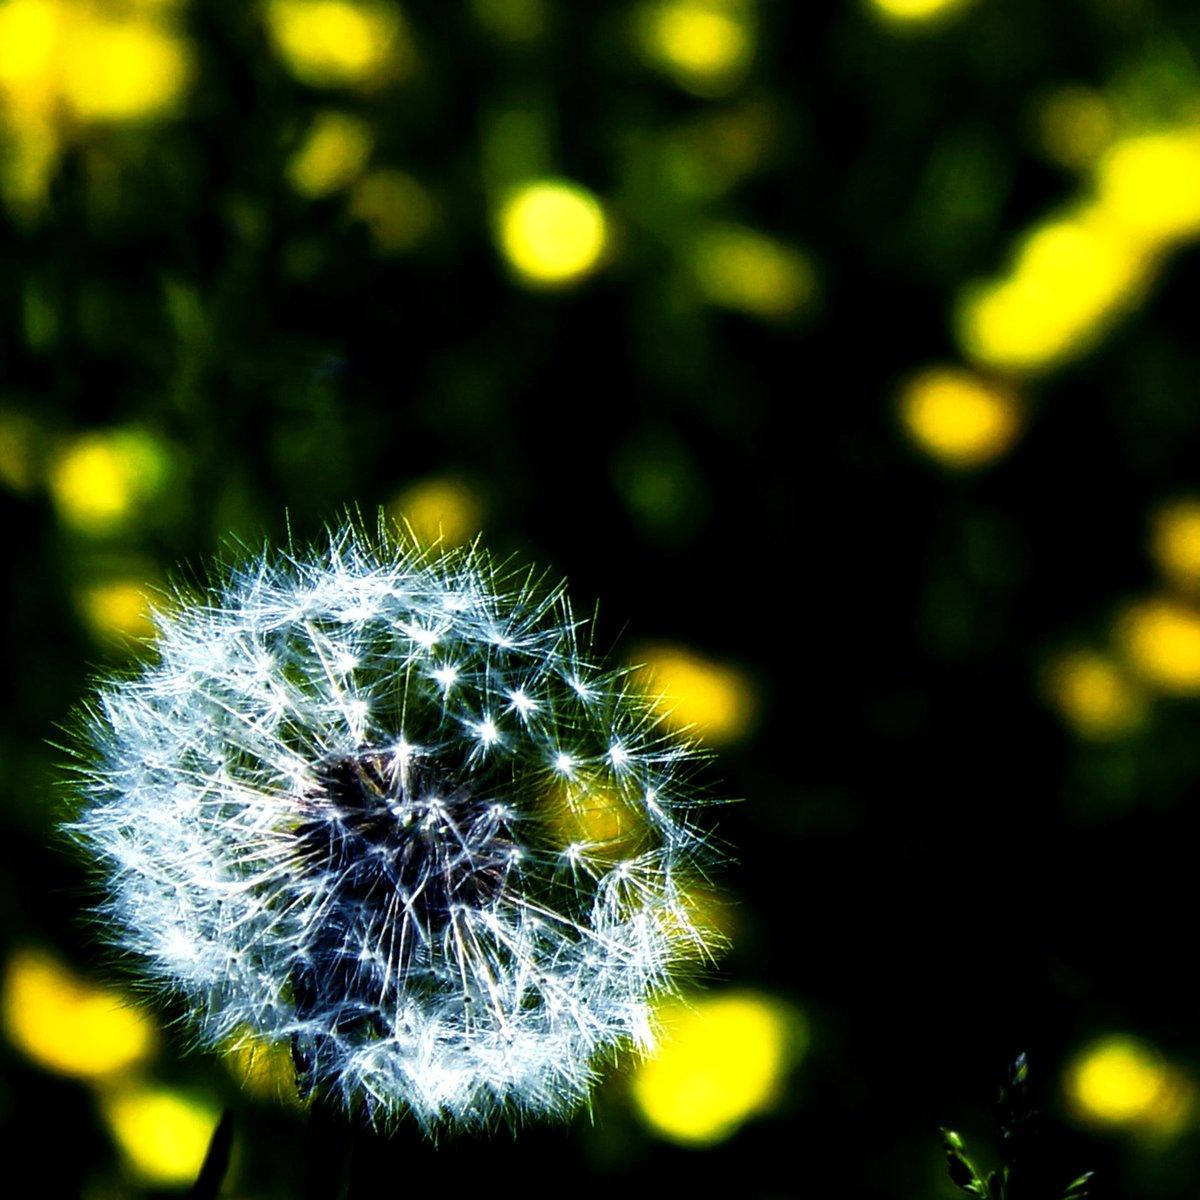 Dandelion & Buttercups - #Dublin #Ireland #wednesdaymorning #yellow #delicate #flower #wildflowers https://t.co/Xnk7COI0Qd